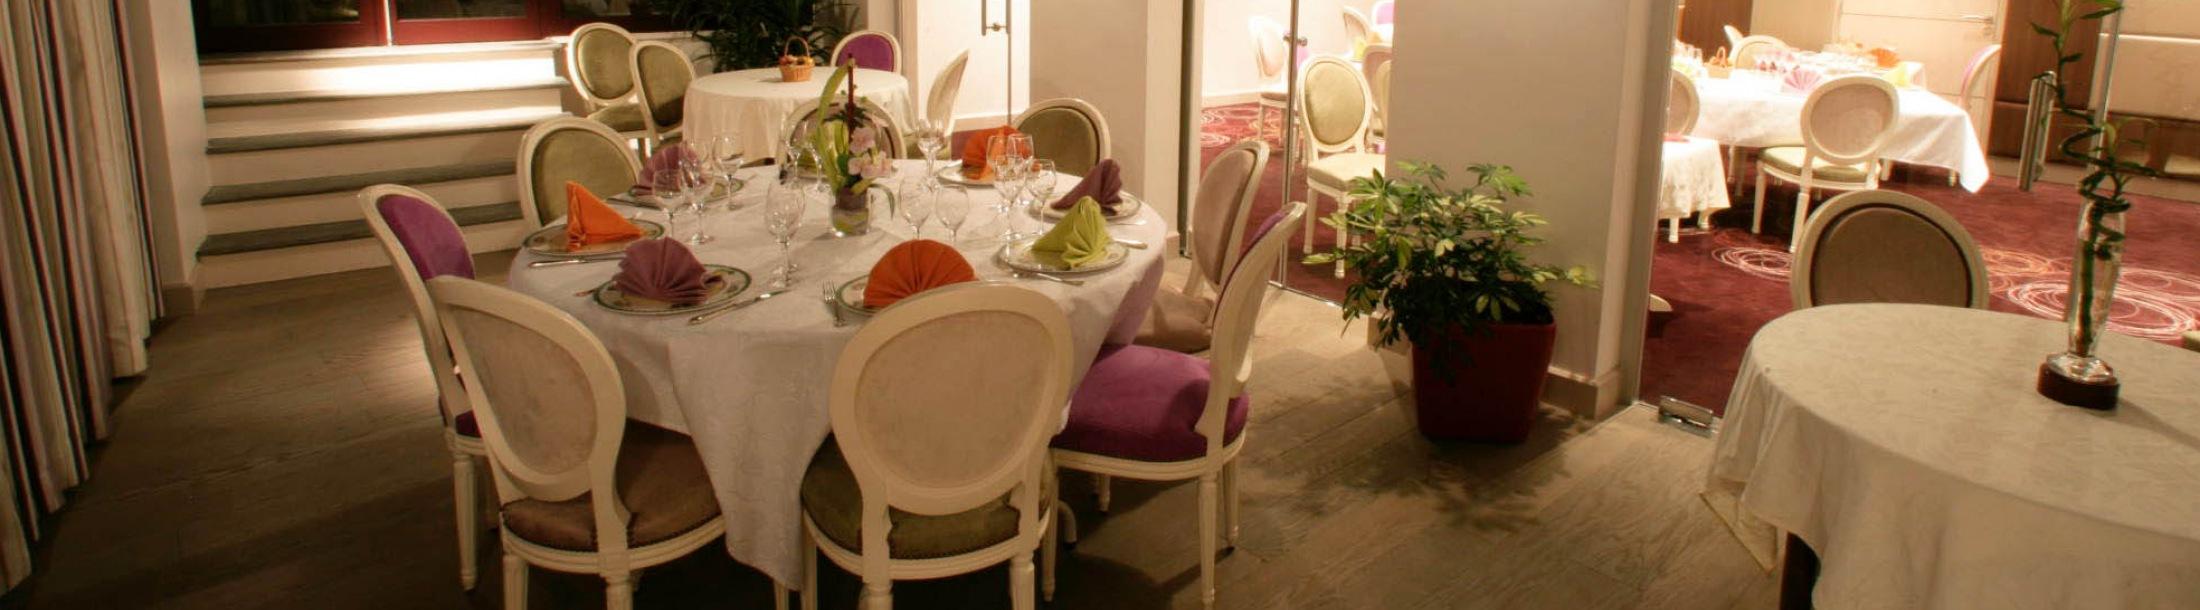 Banquet familial